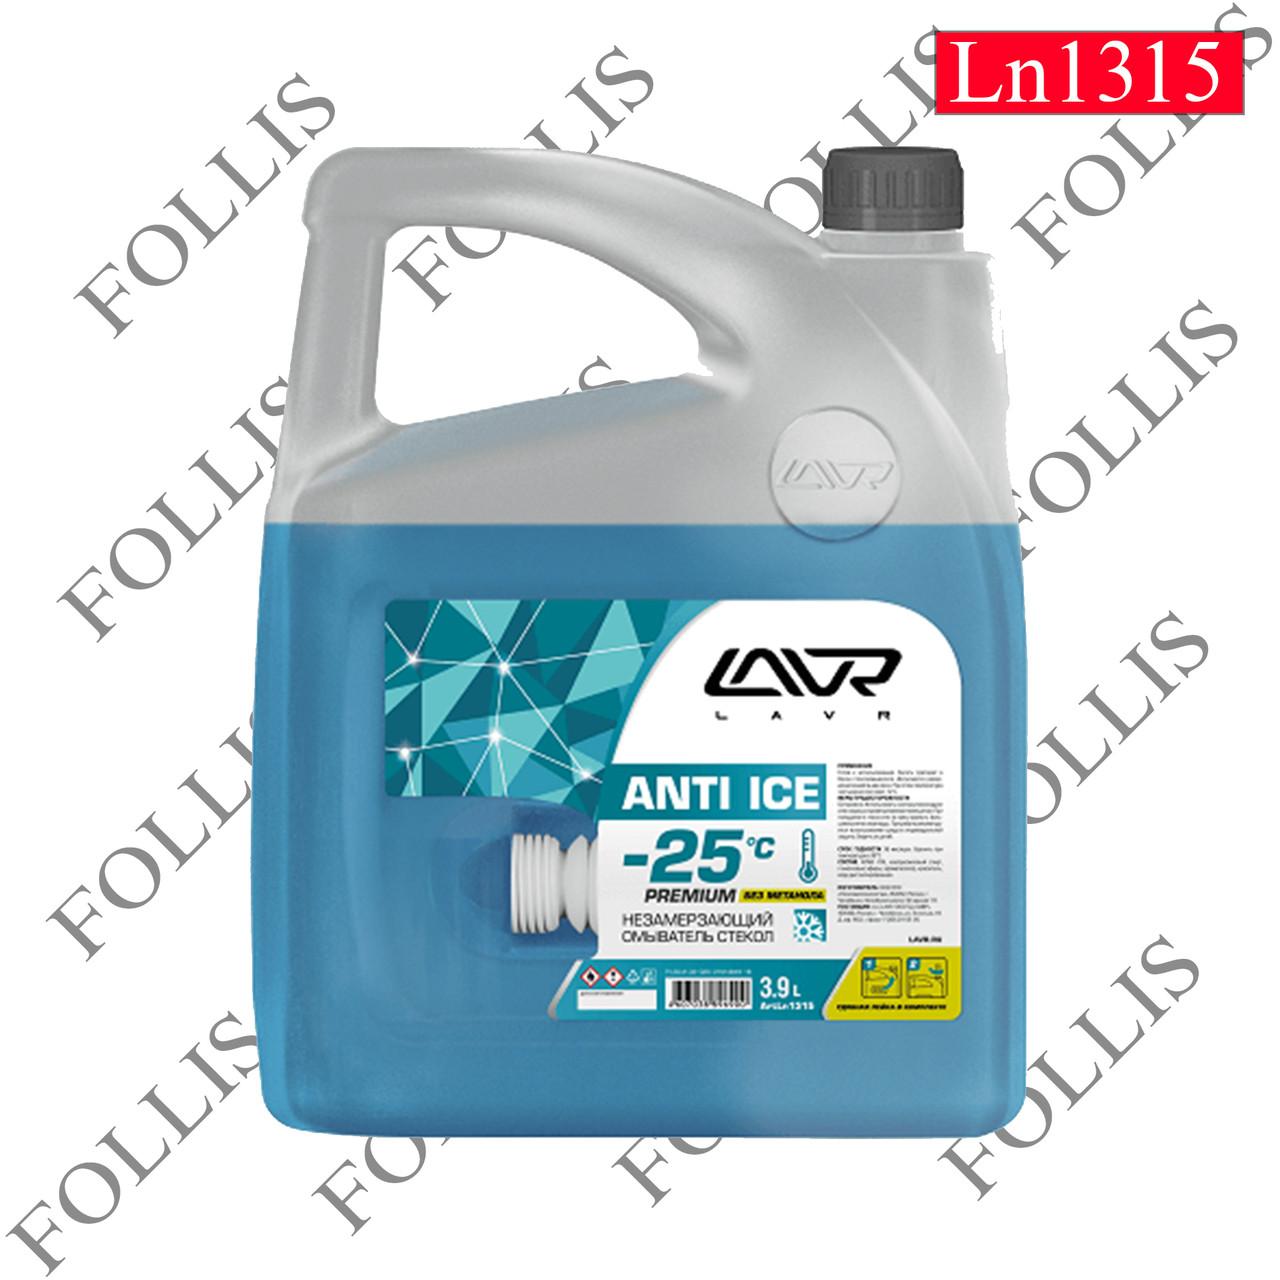 Незамерзающий омыватель стекол -25°С LAVR Anti-ice Premium 3,9 л